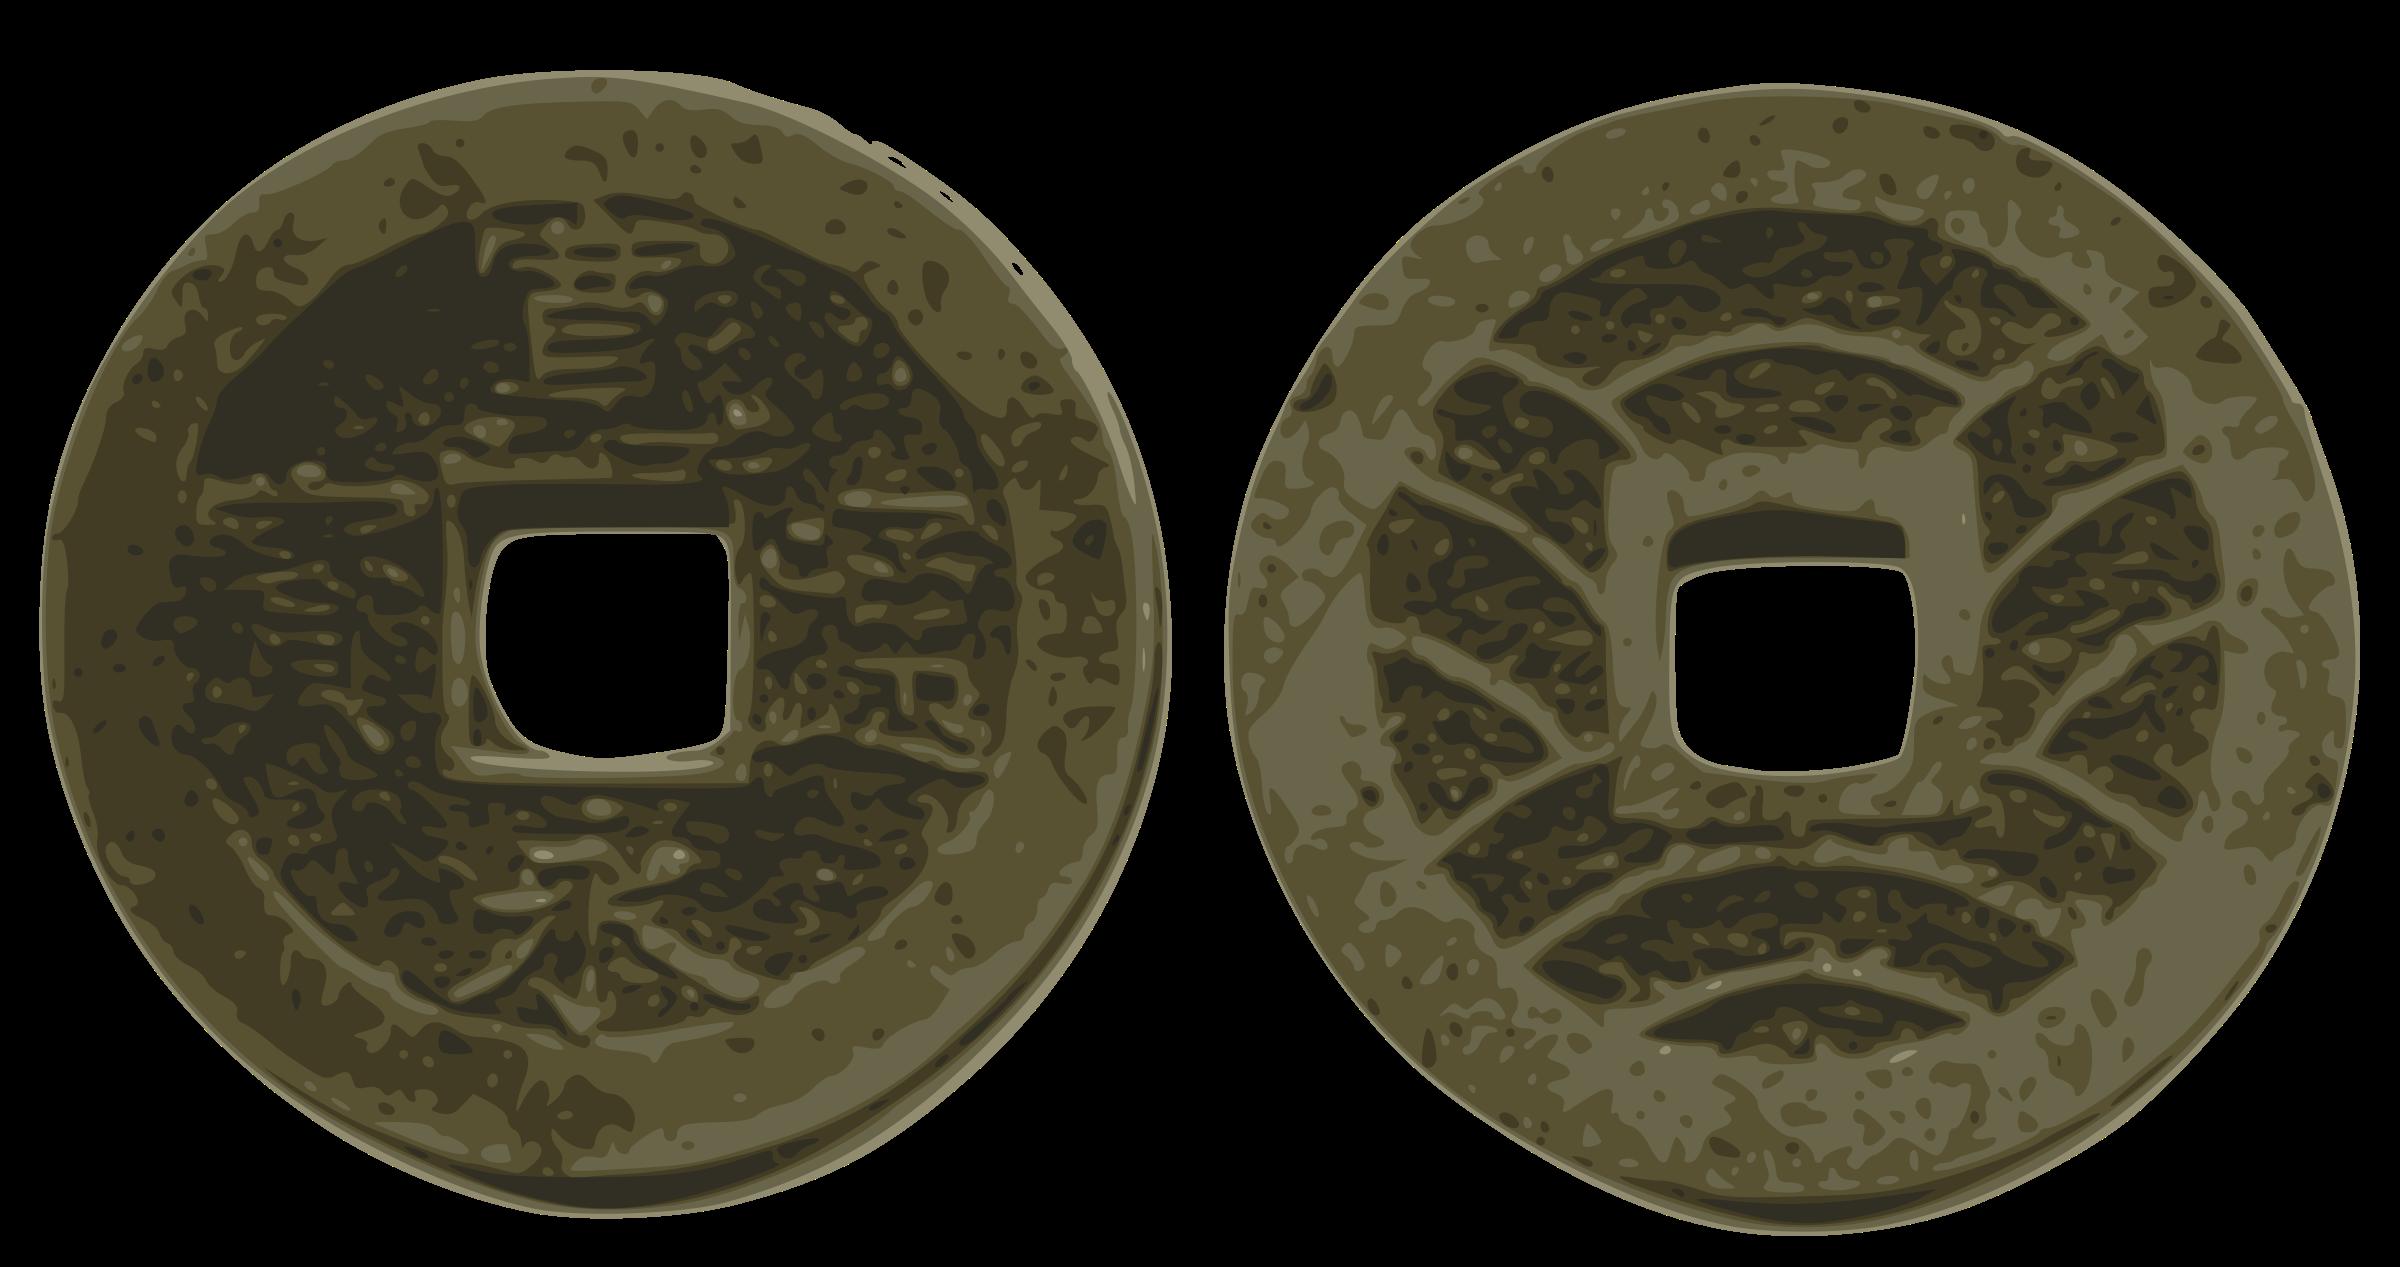 Coin clipart english. Japanese edo big image